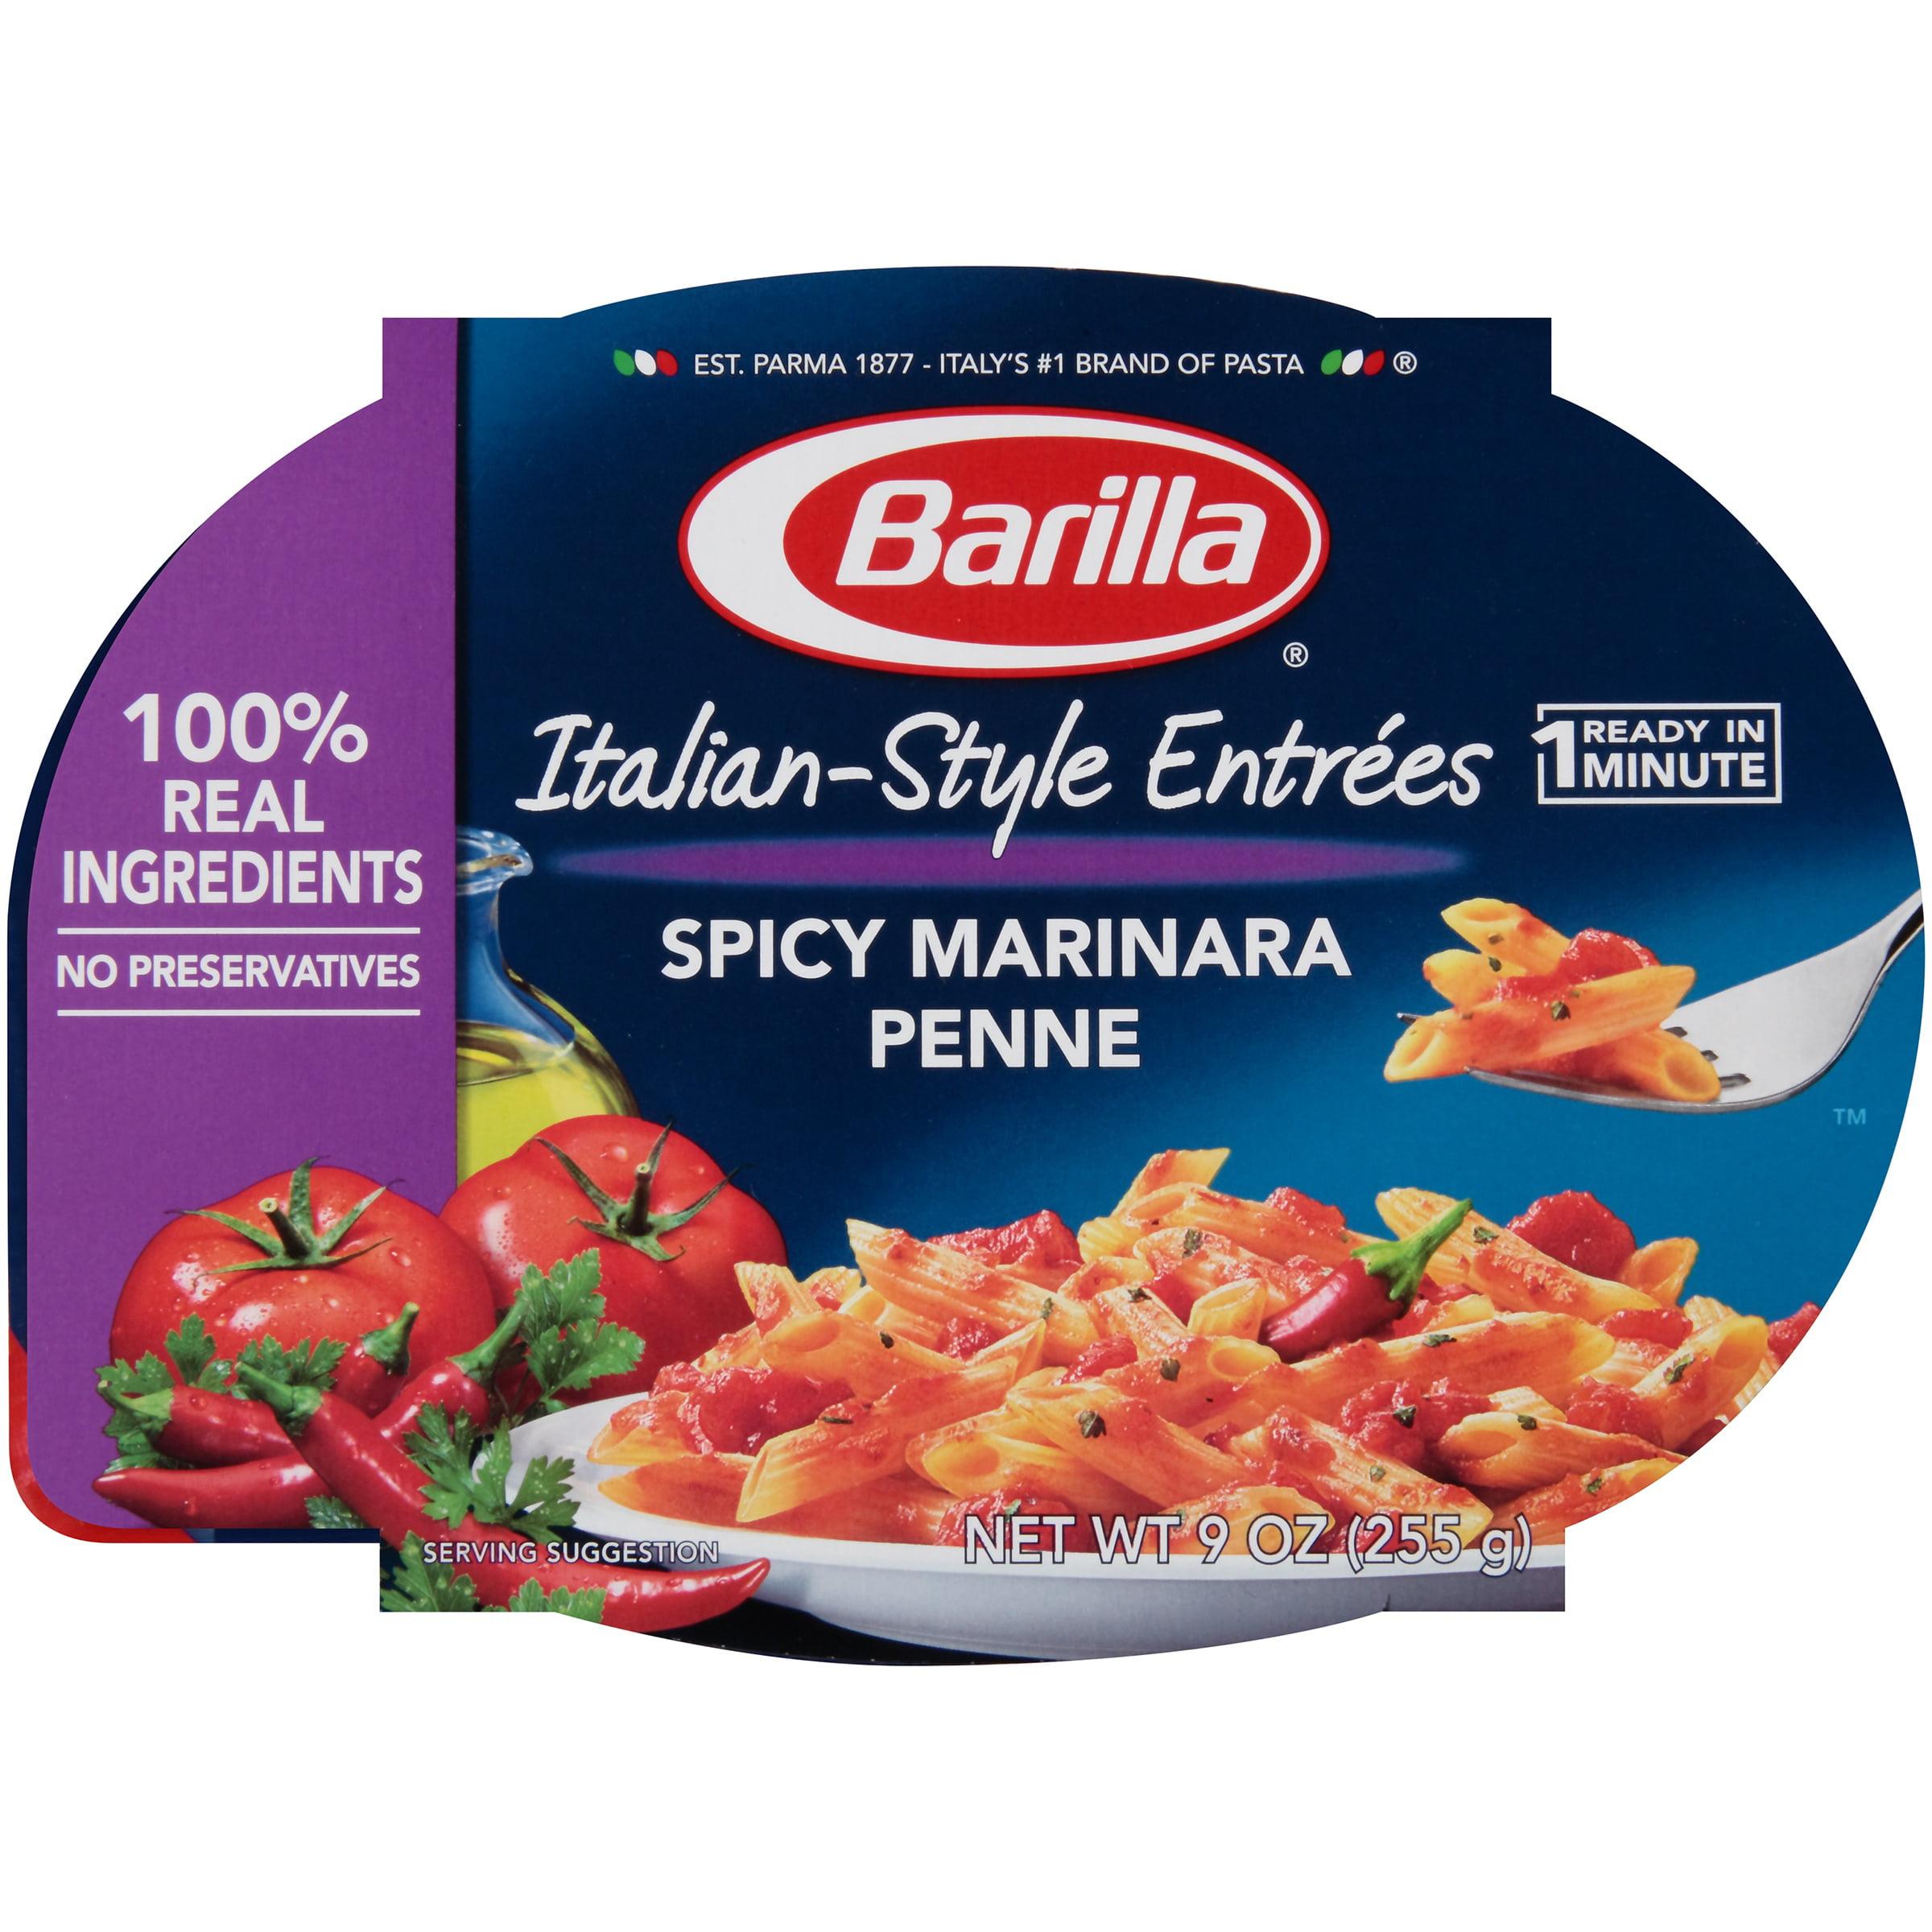 Barilla Italian-Style Entrées Spicy Marinara Penne Pasta, 9 oz by Barilla America, Inc.